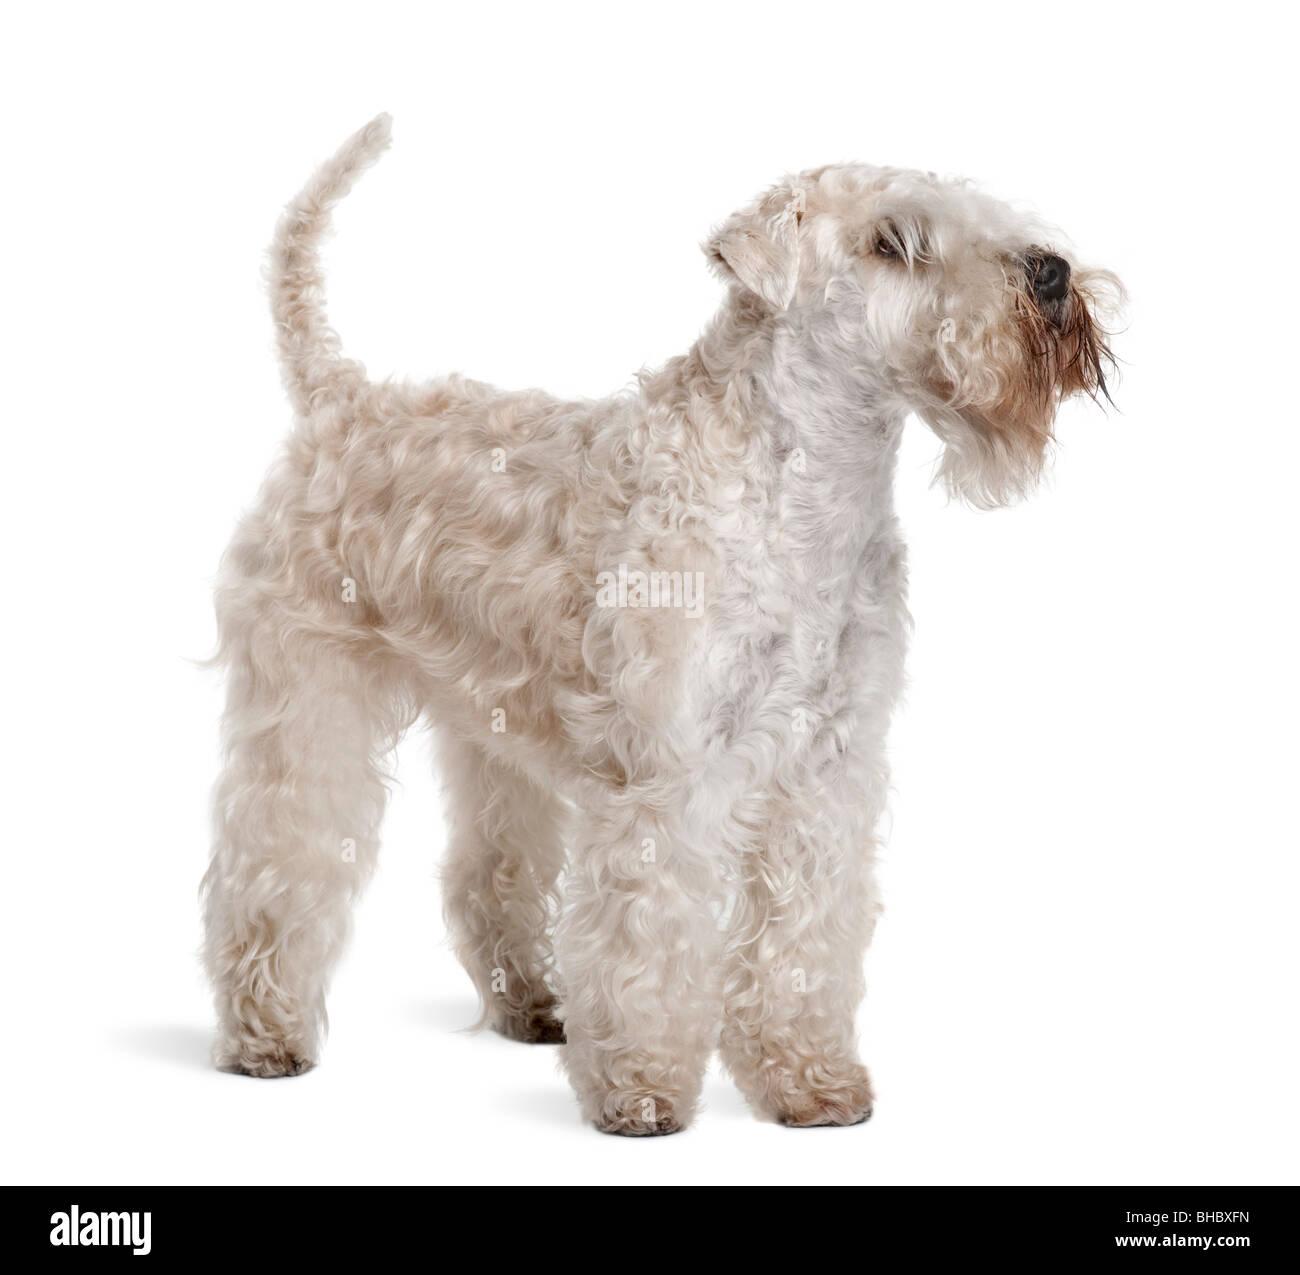 Wheaten Terrier Stock Photos & Wheaten Terrier Stock Images - Alamy